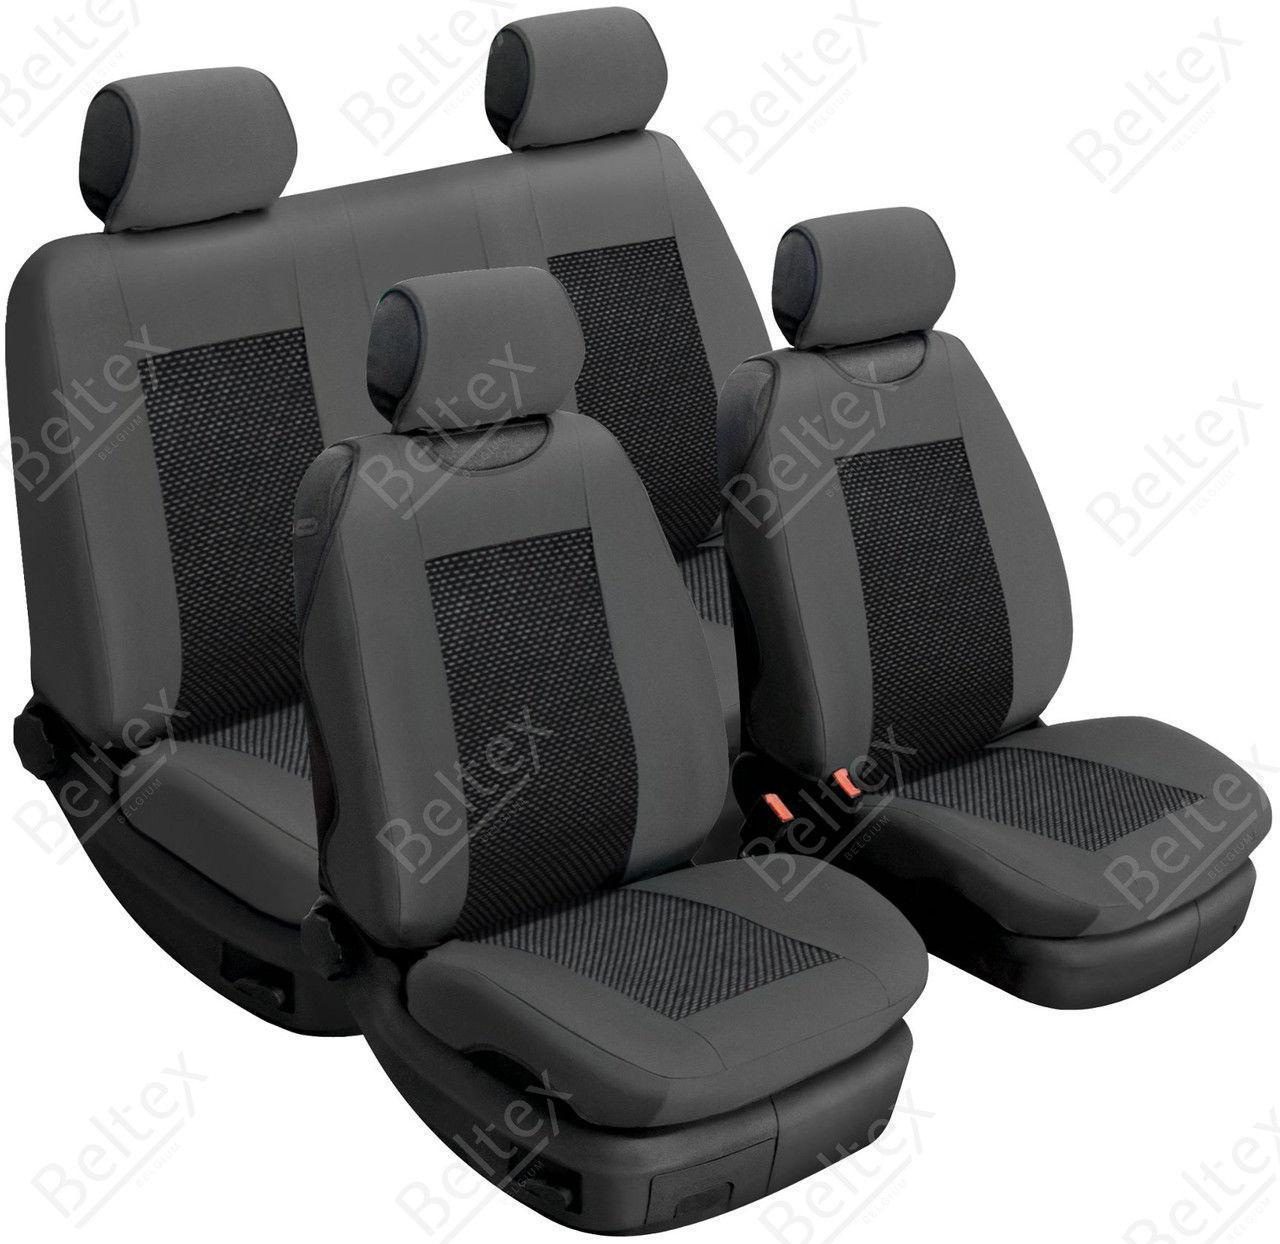 Майки/чехлы на сиденья Ауди 80 Б4 (Audi 80 B4)